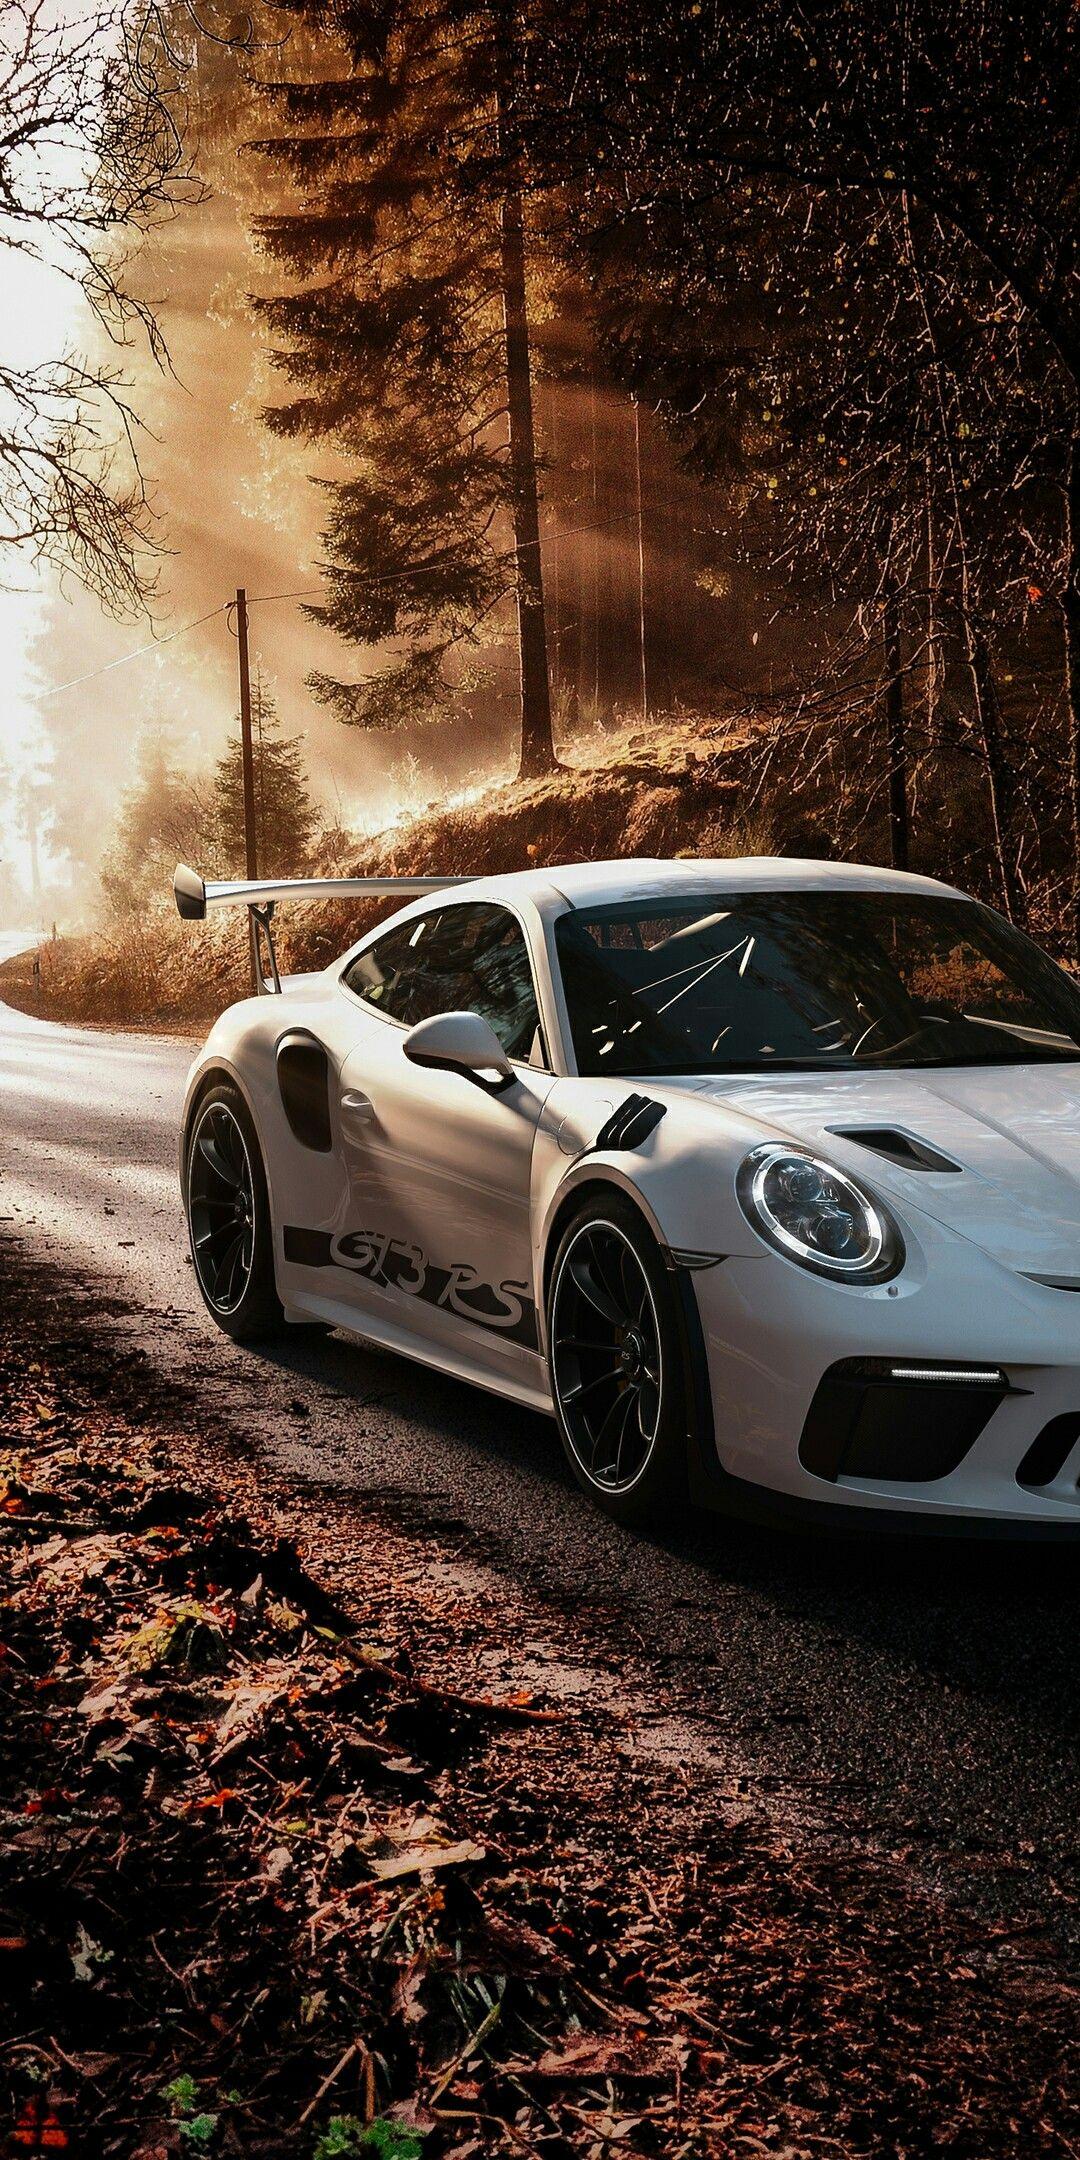 50+ best luxury cars for wallpaper a717bbe3dc5f89825647171eea280994